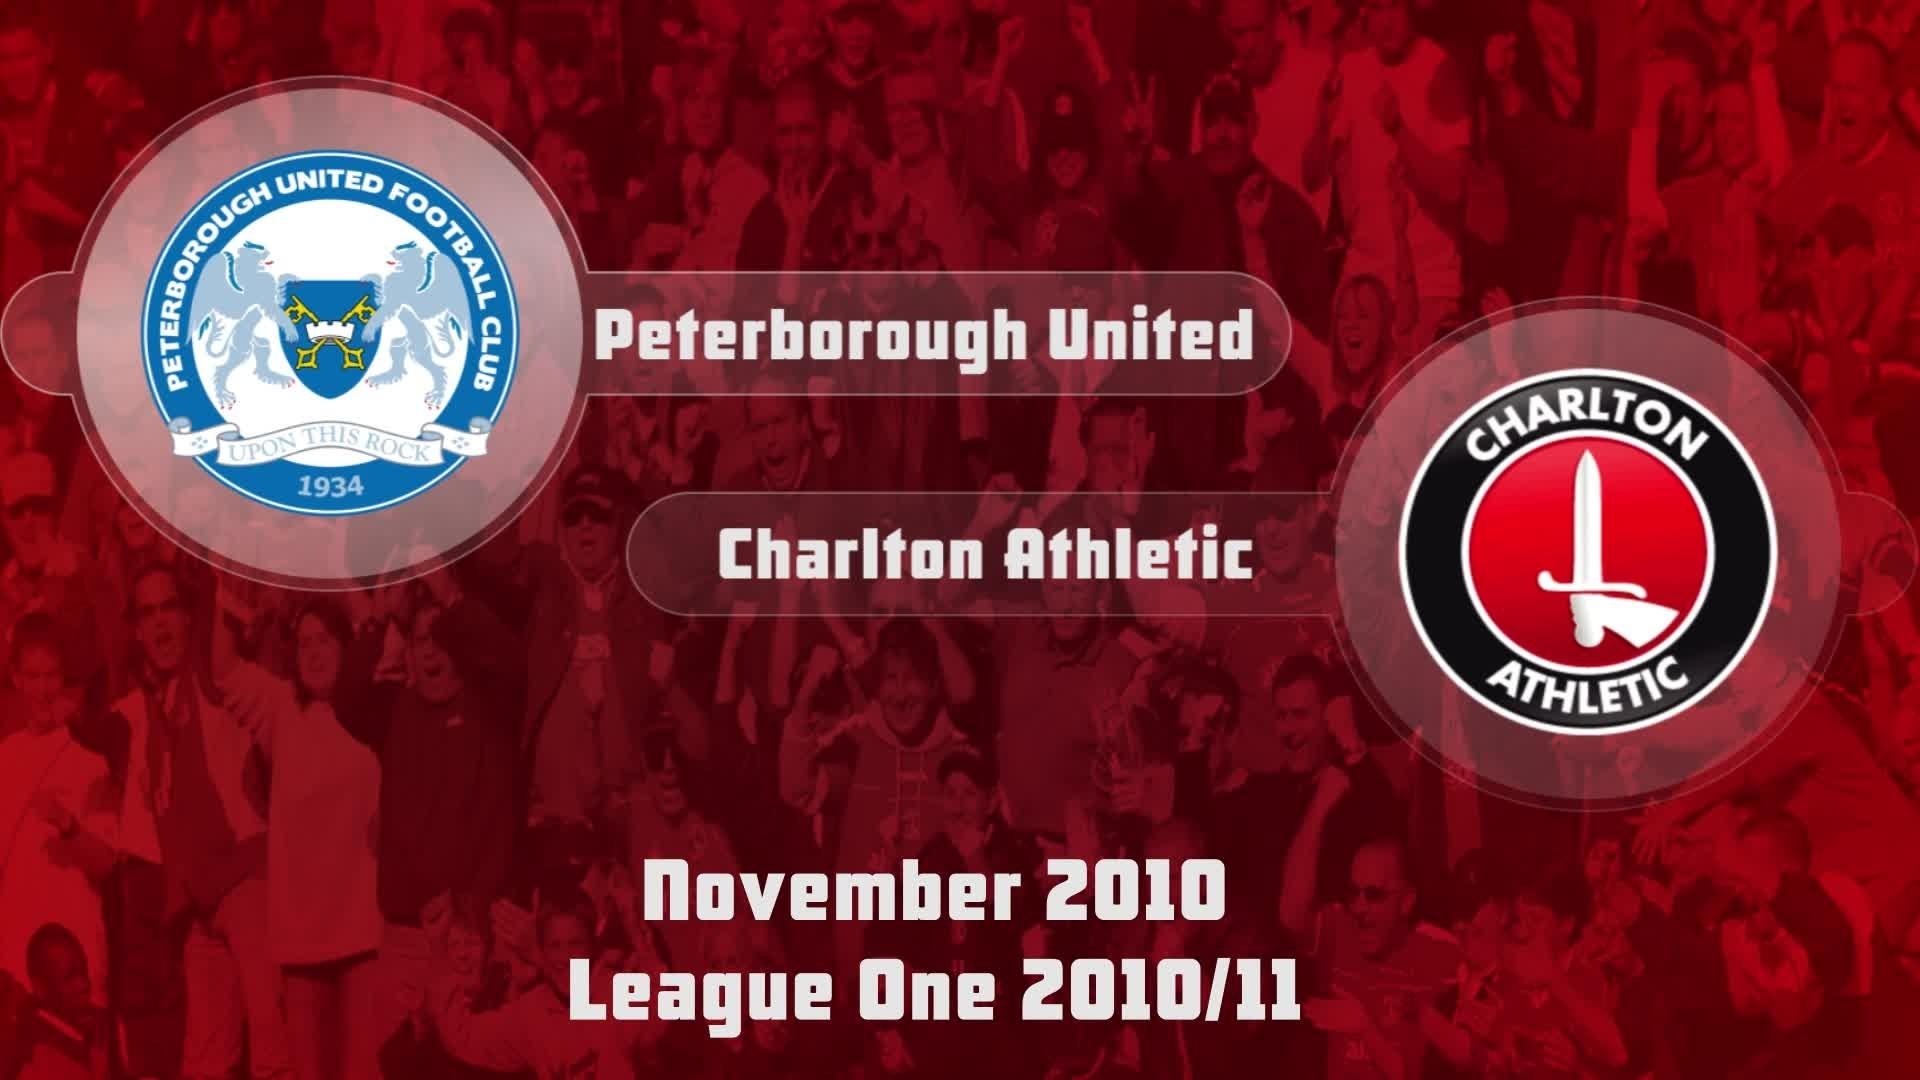 21 HIGHLIGHTS | Peterborough 1 Charlton 5 (Nov 2010)